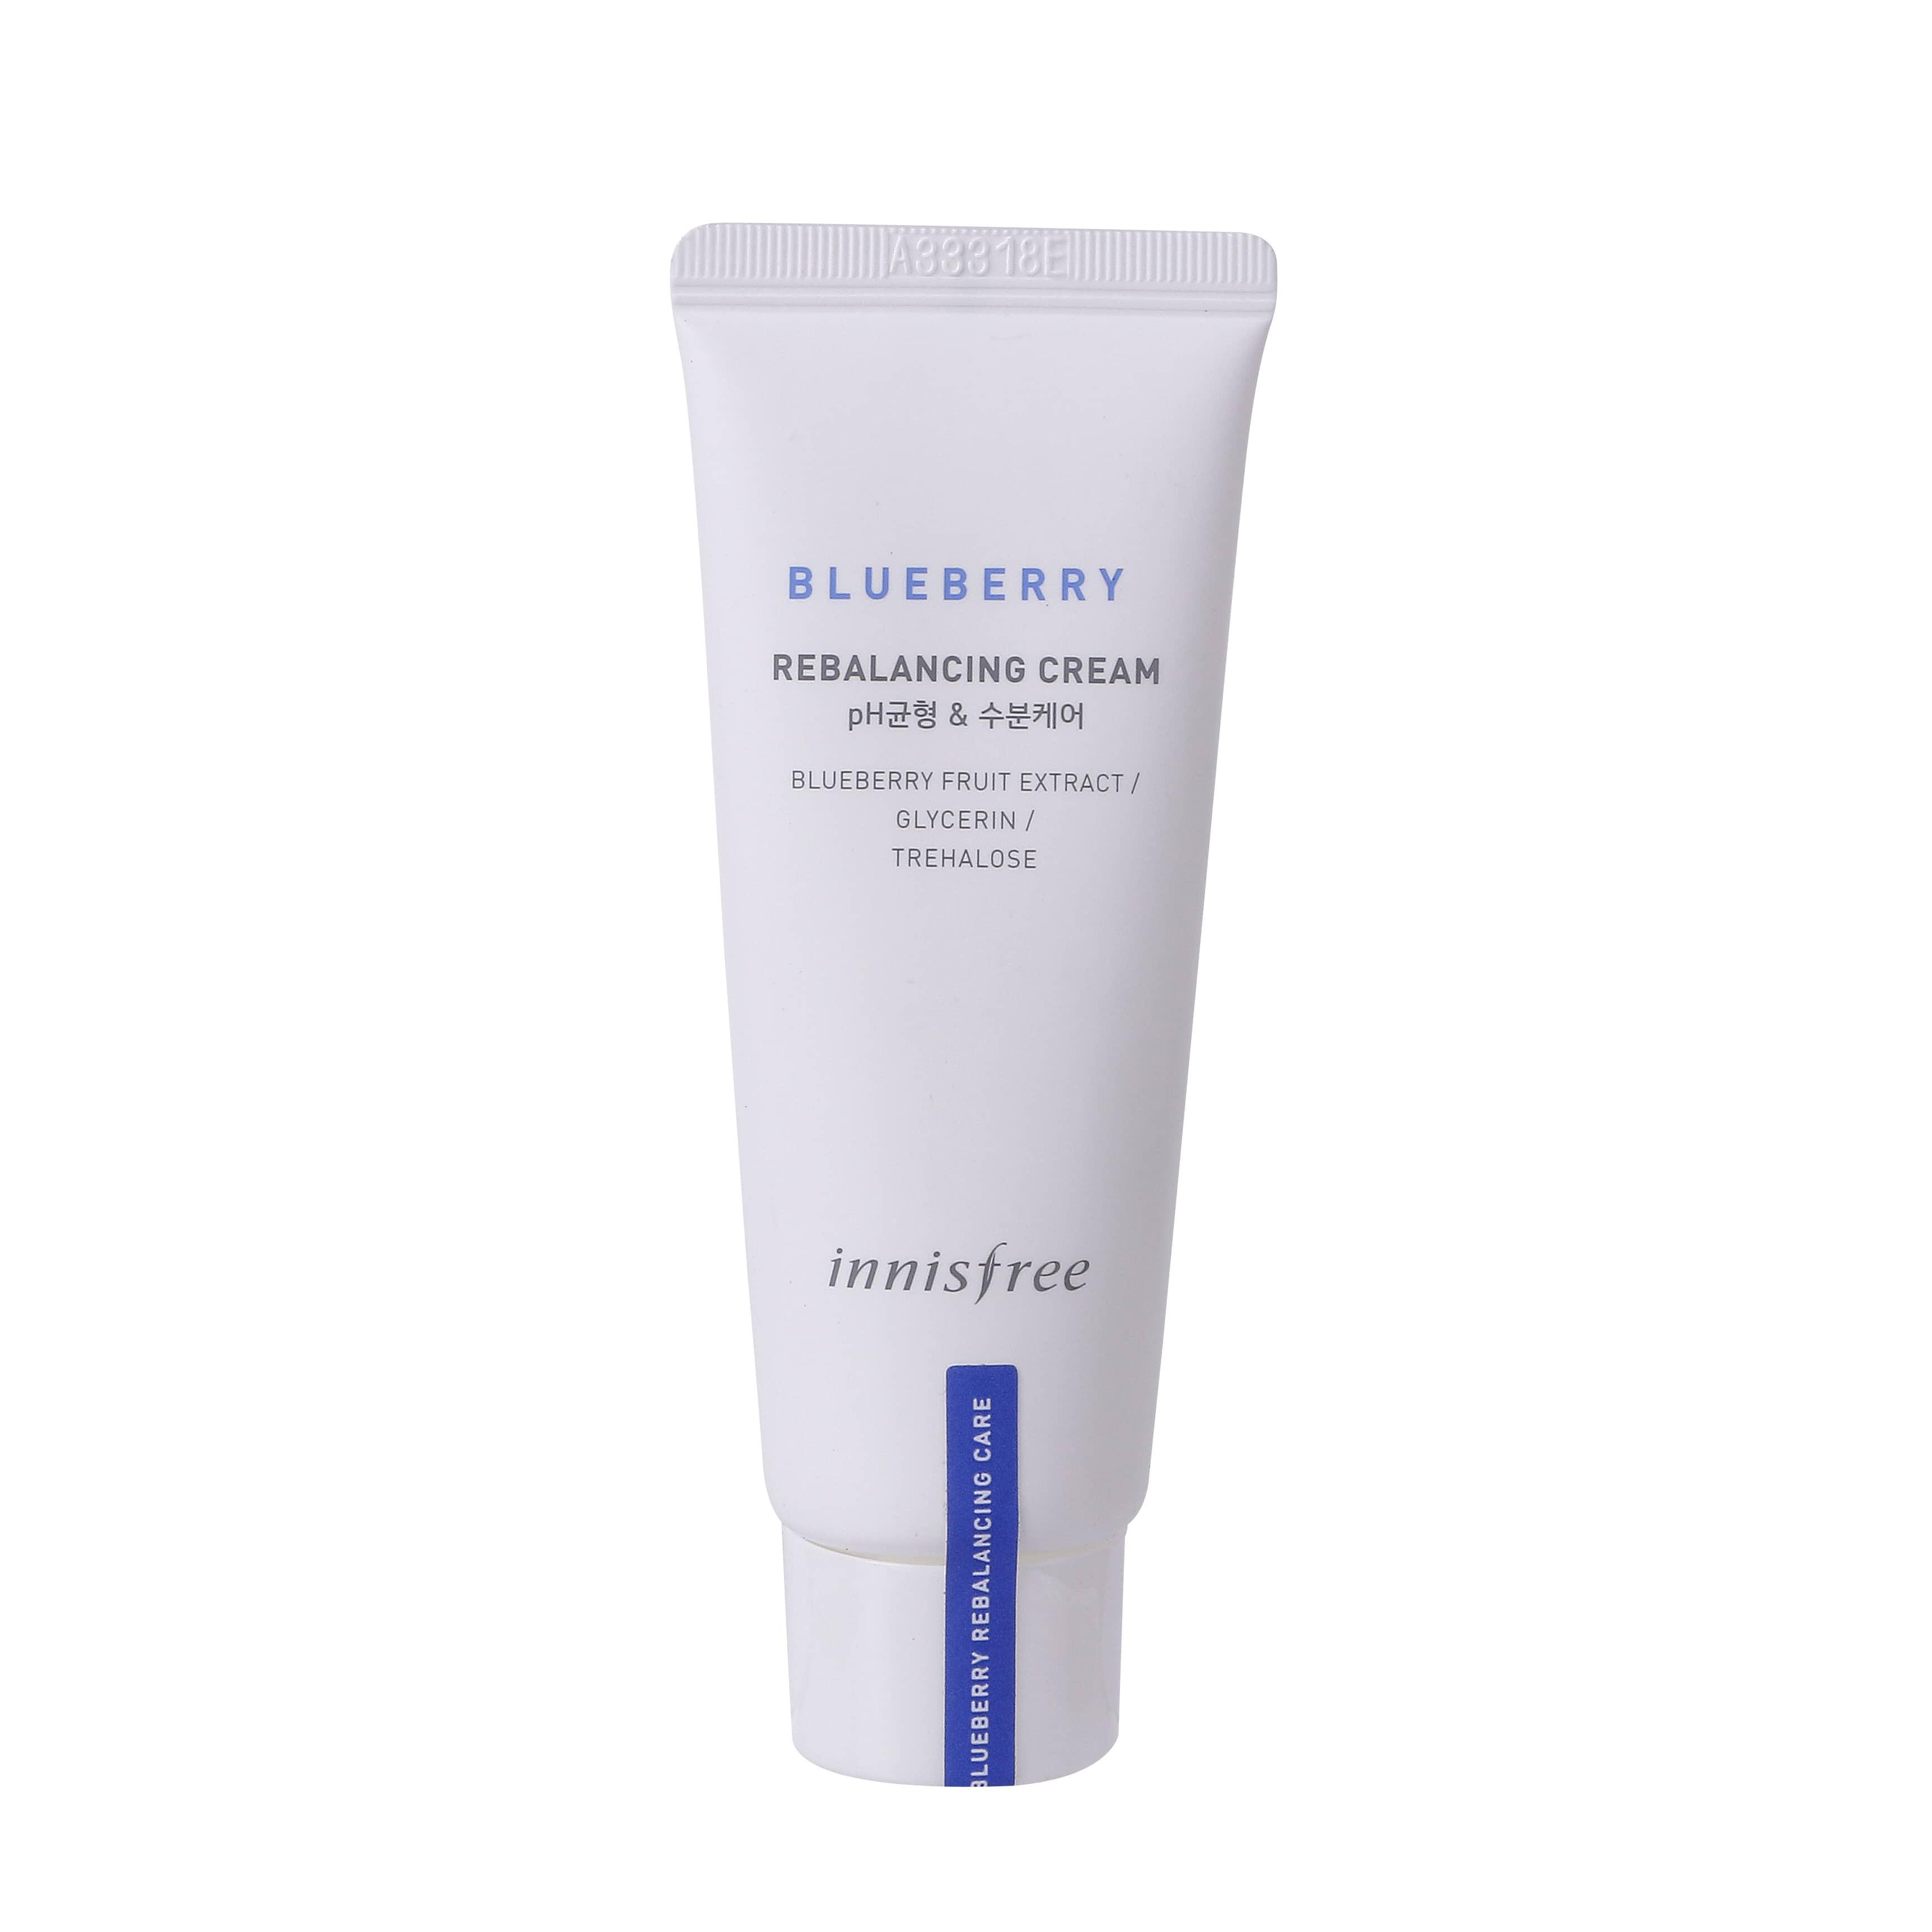 image of 韓國 innisfree 藍莓再平衡乳液 50ml  Korea Innisfree Blueberry Rebalancing Cream 50ml